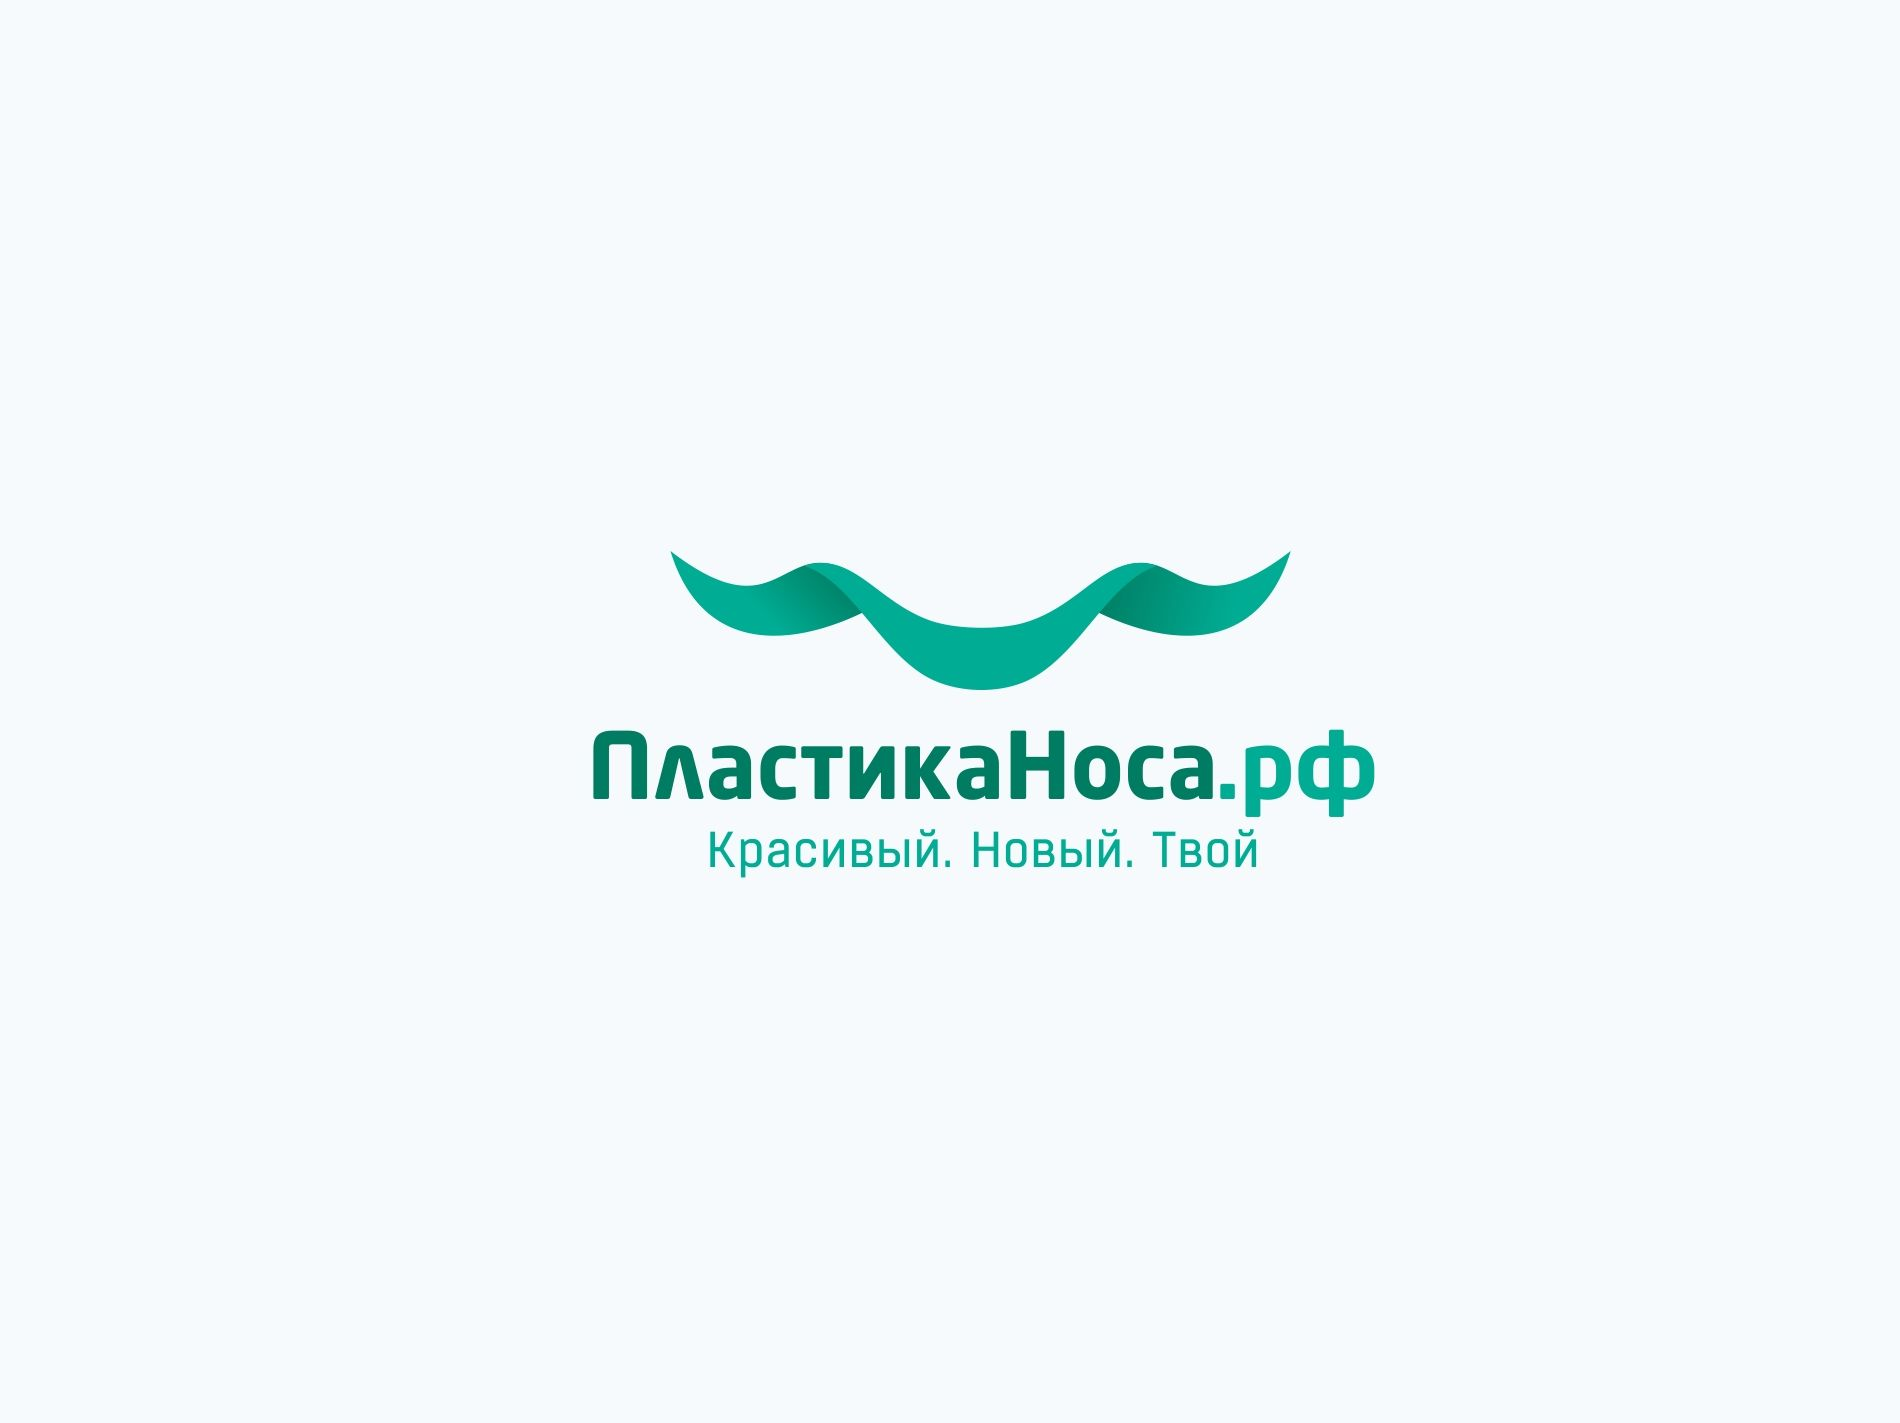 Логотип ПластикаНоса.рф - дизайнер kras-sky